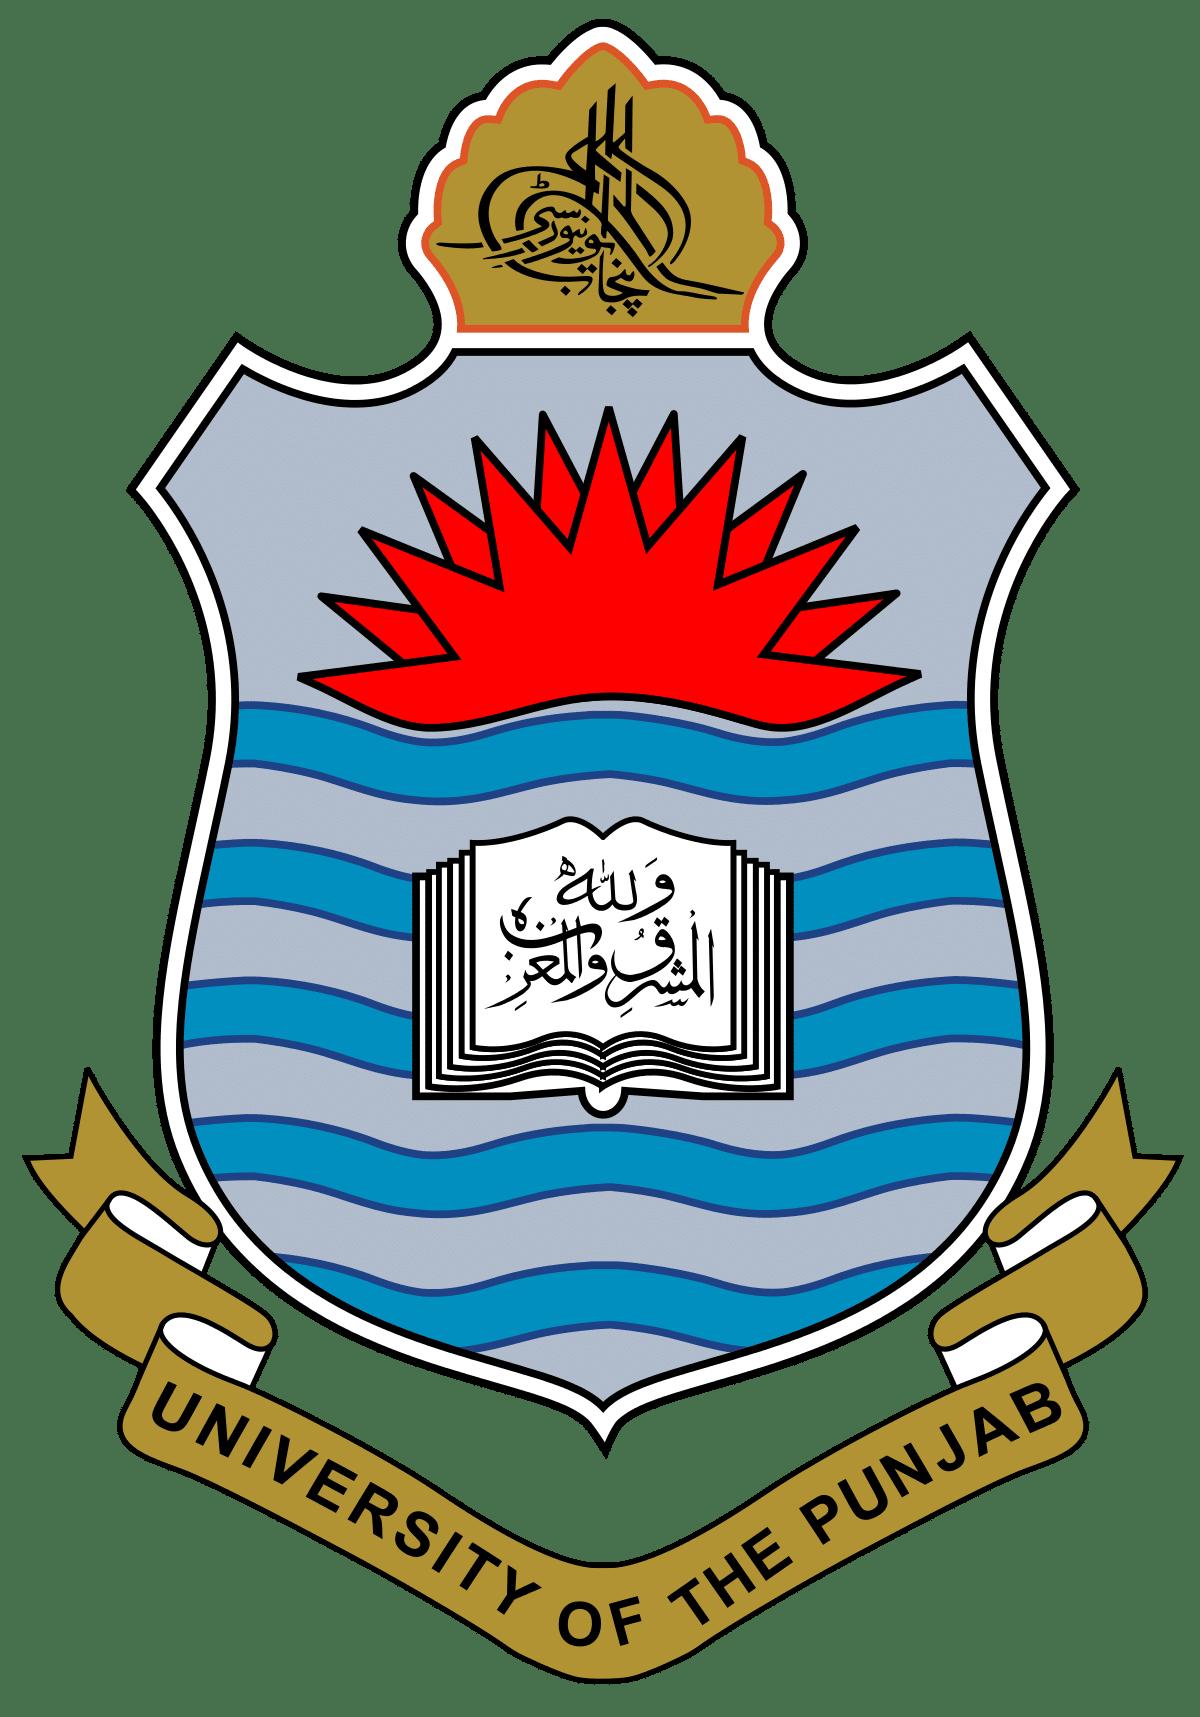 Punjab University BA/BSc Registration Form 2019 Download Last Date